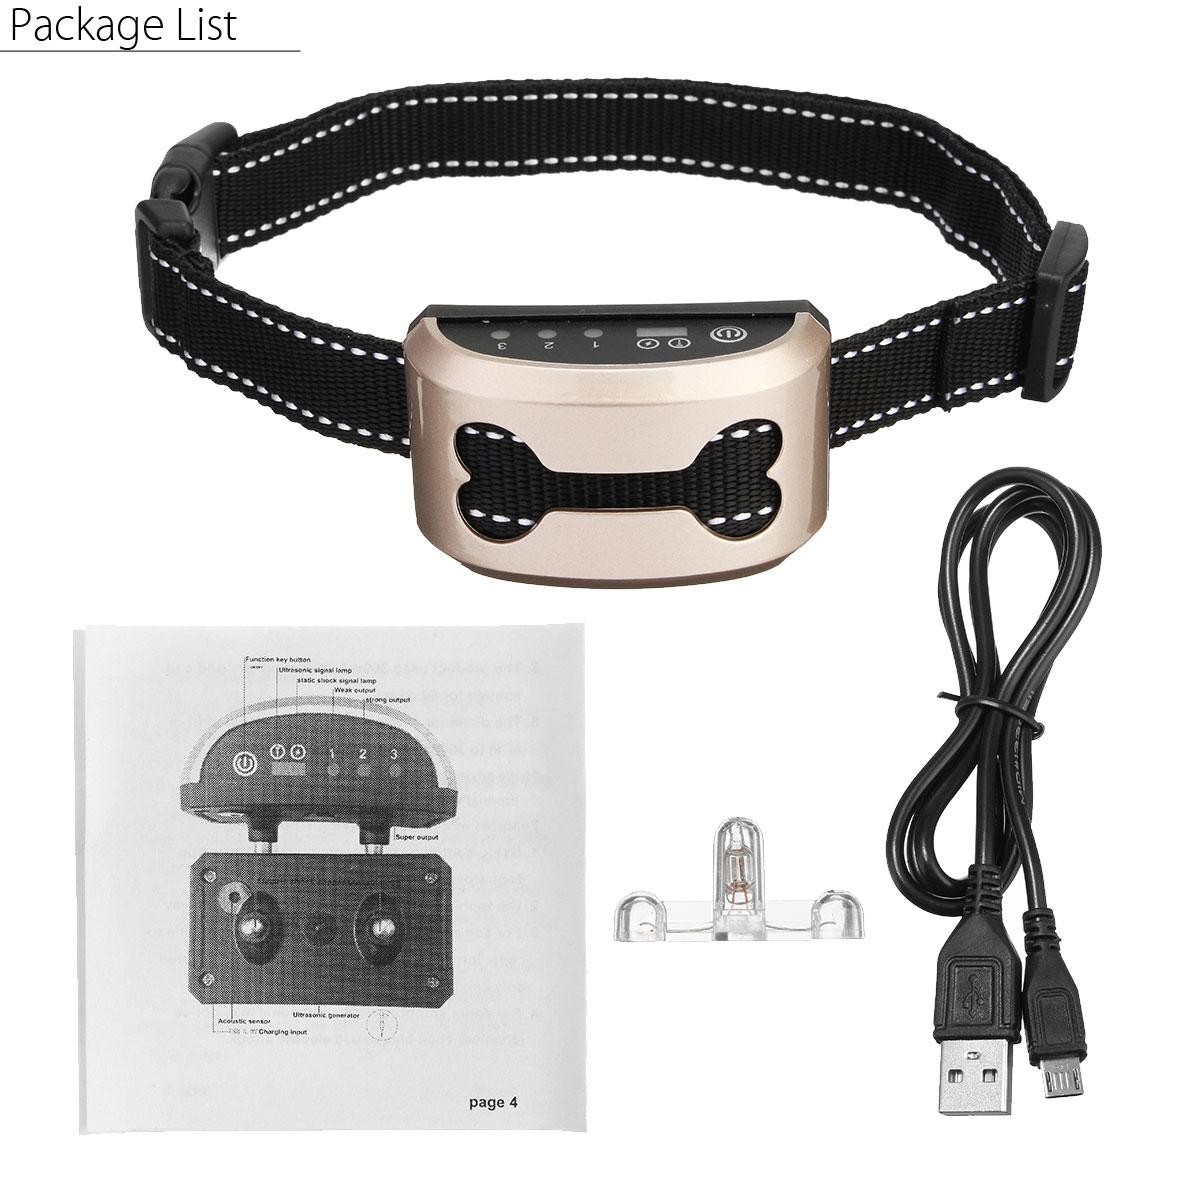 Electric Bark Control Collar for Dog Collar Anti Bark Dog Training Rechargeable Waterproof Shock Collar Auto Anti Bark Device 6